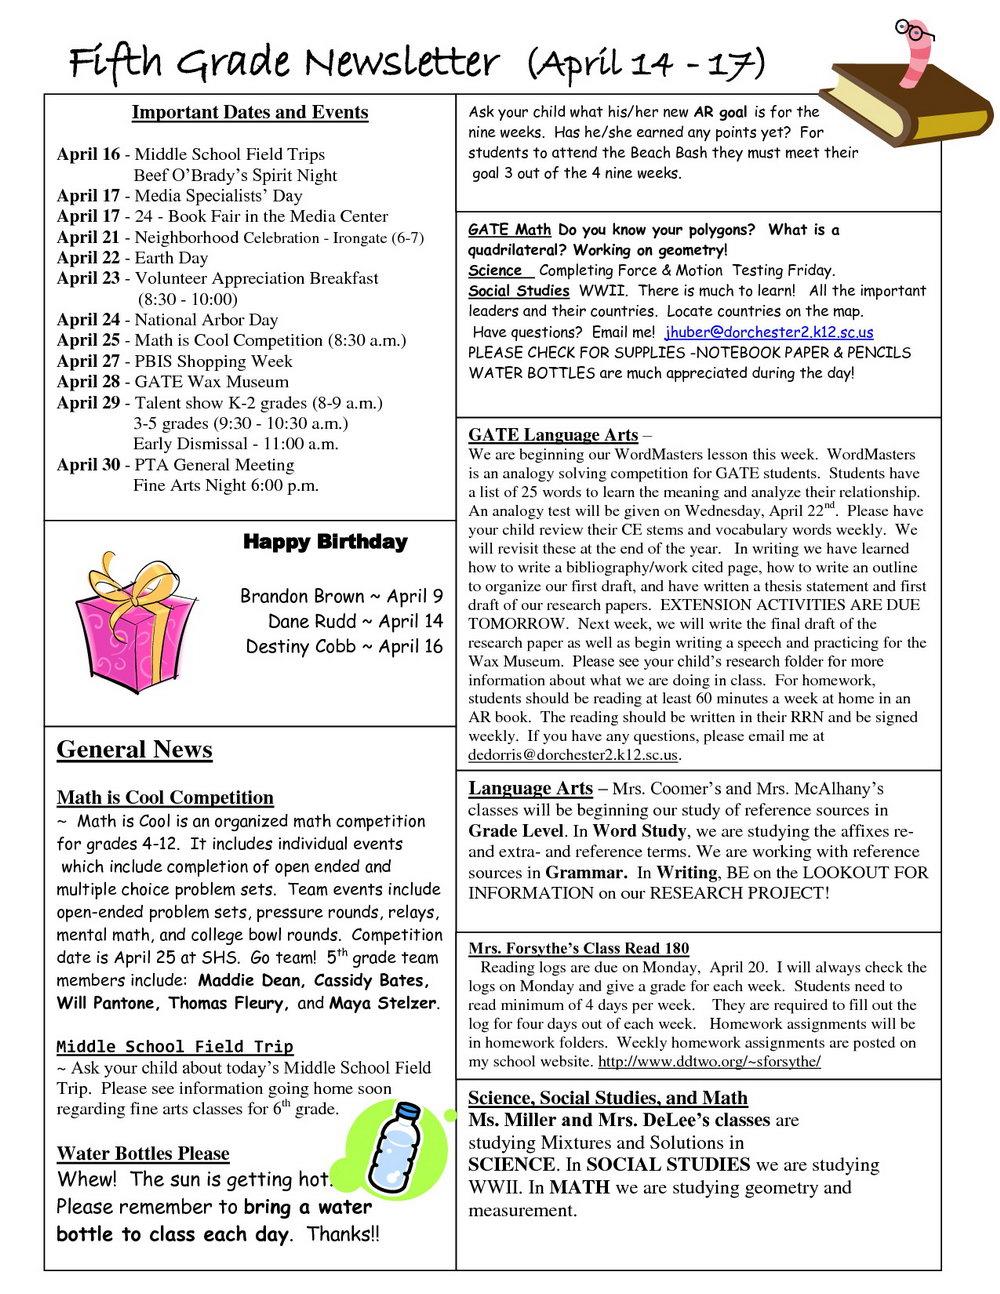 5th Grade Newsletter Template